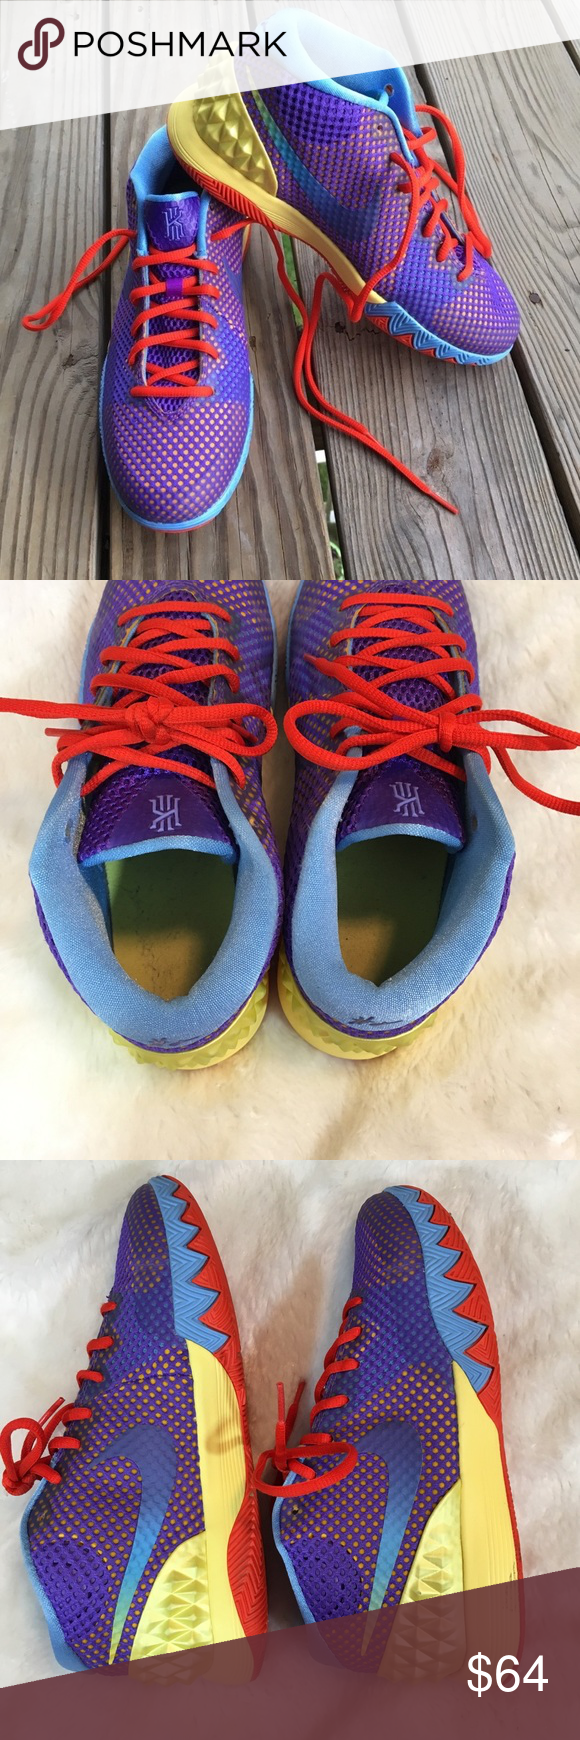 c50ba784ff78 🆕Nike Kyrie 1 Saturdays Basketball Sneakers Nike Kyrie 1 Saturdays  Basketball Sneakers. Kyrie Irving